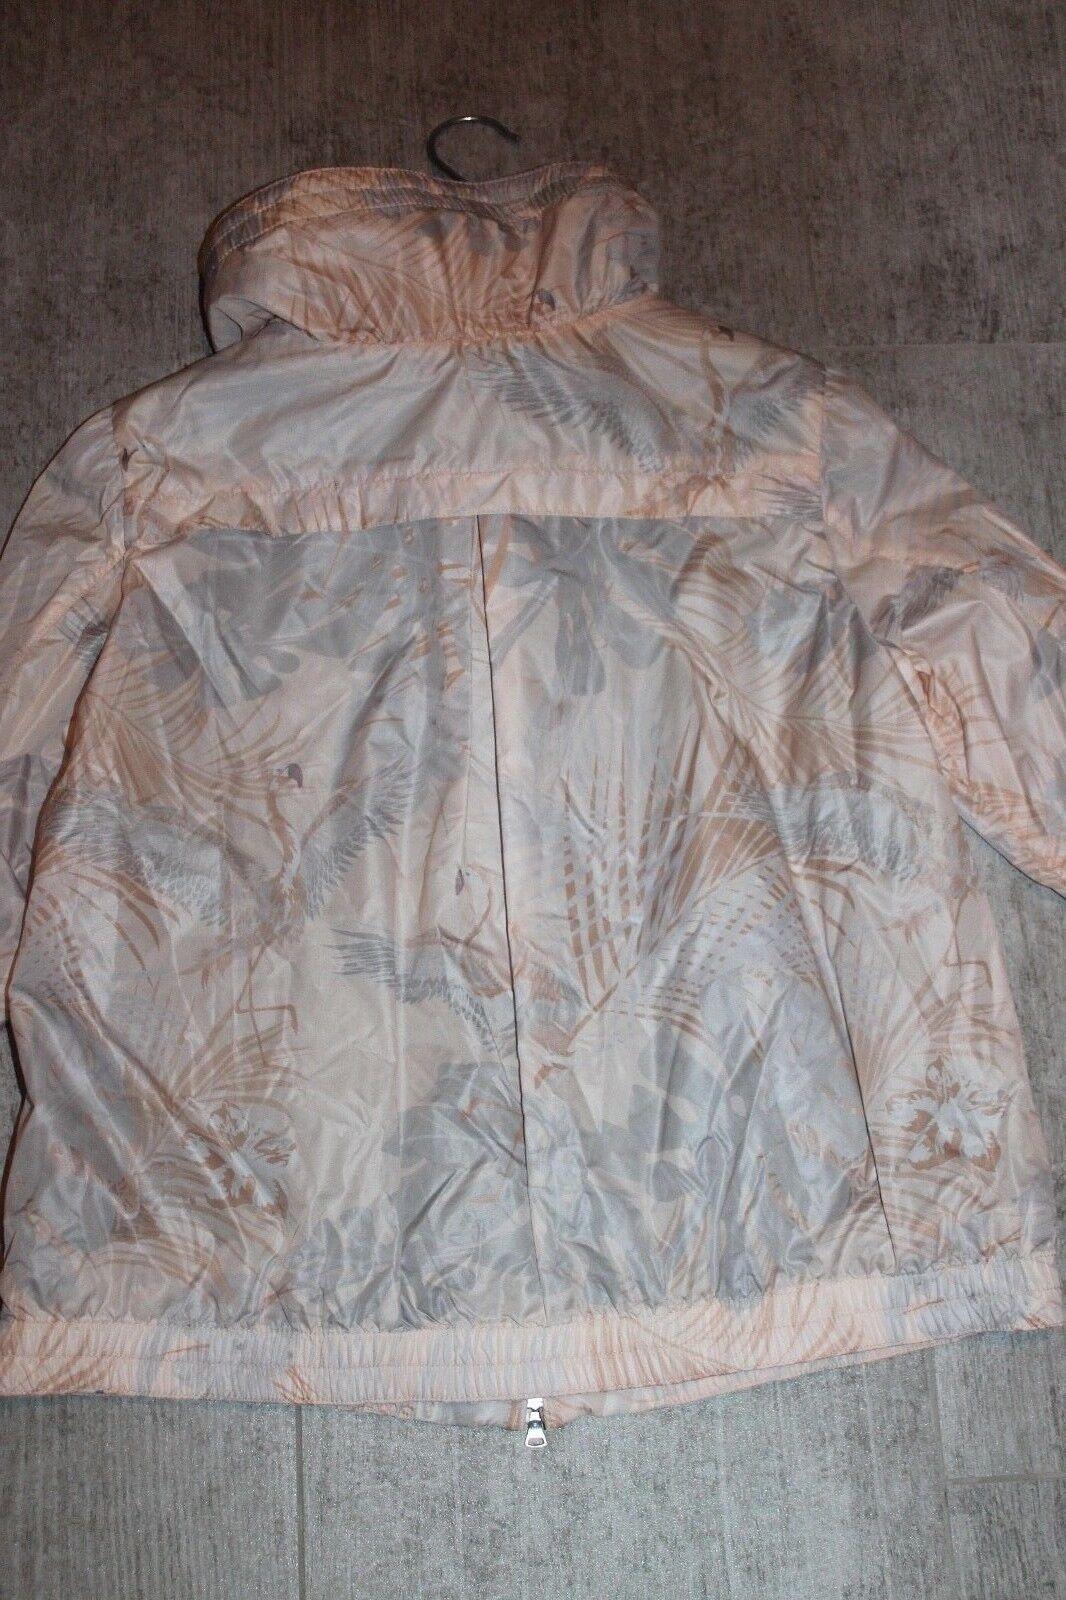 Bogner señora chaqueta deportiva deportiva deportiva simi gris beige talla 36 PVP 449 euros aef44b